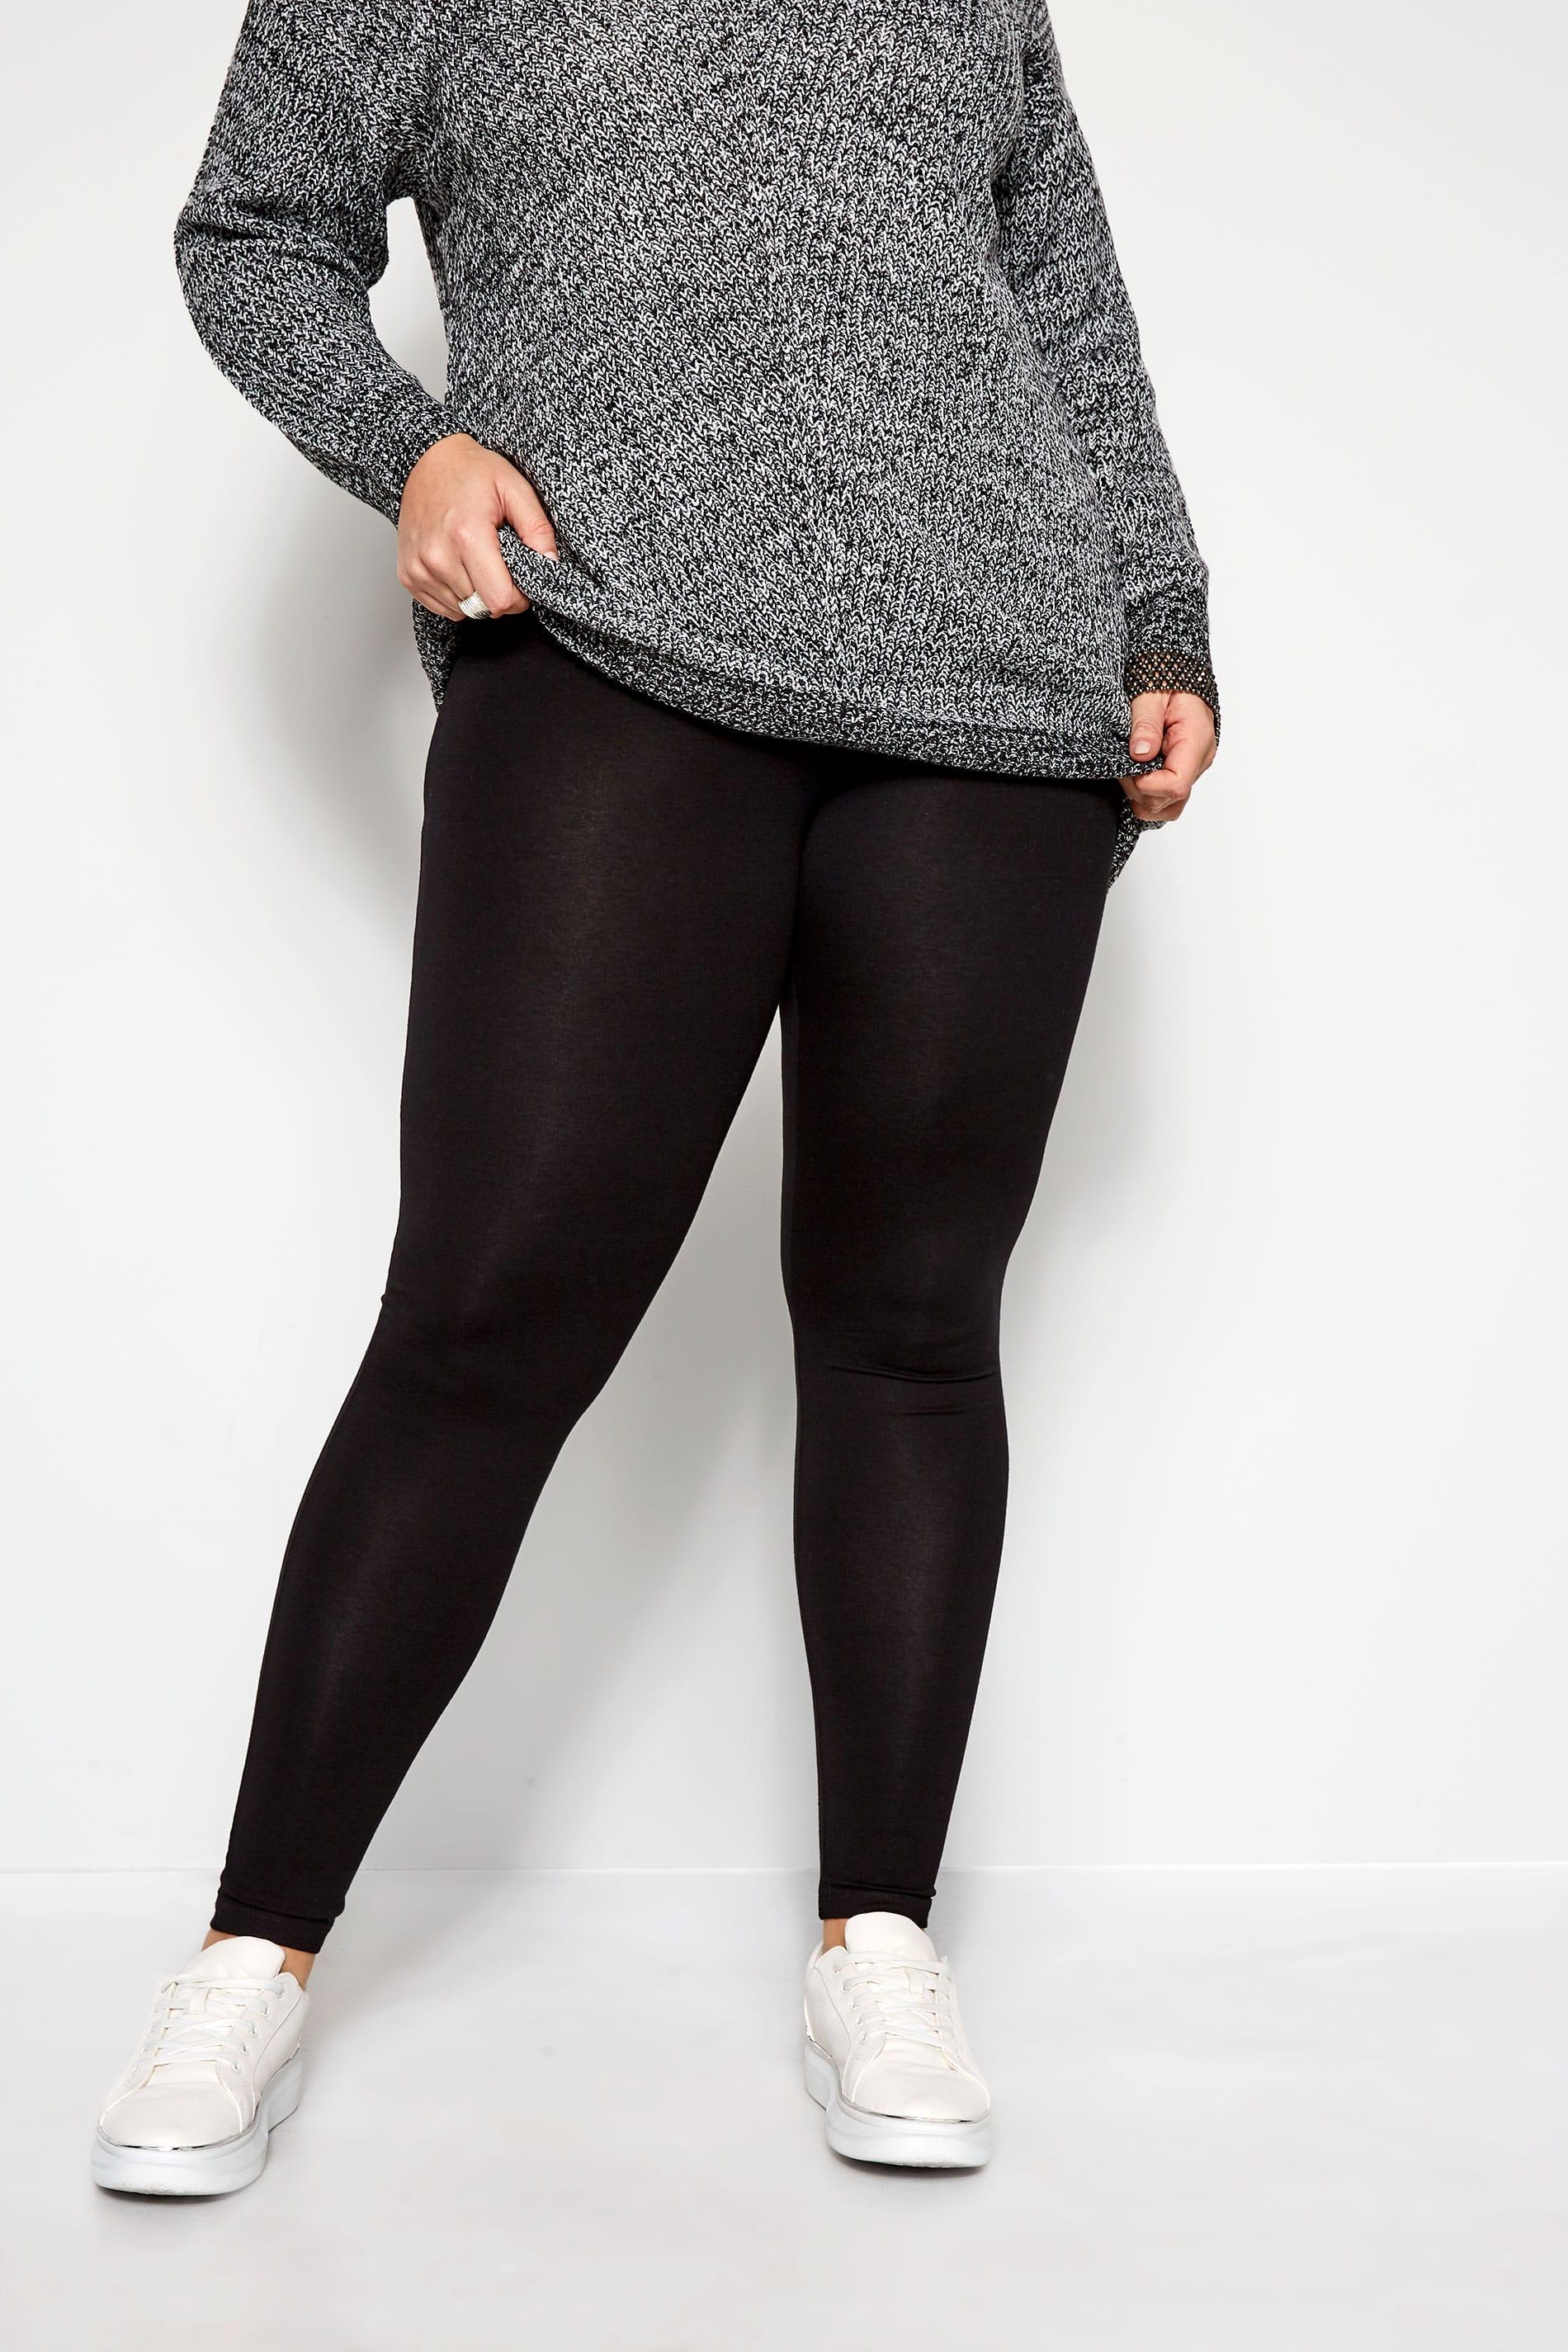 Black TUMMY CONTROL Soft Touch Leggings Plus Size 16 to 36